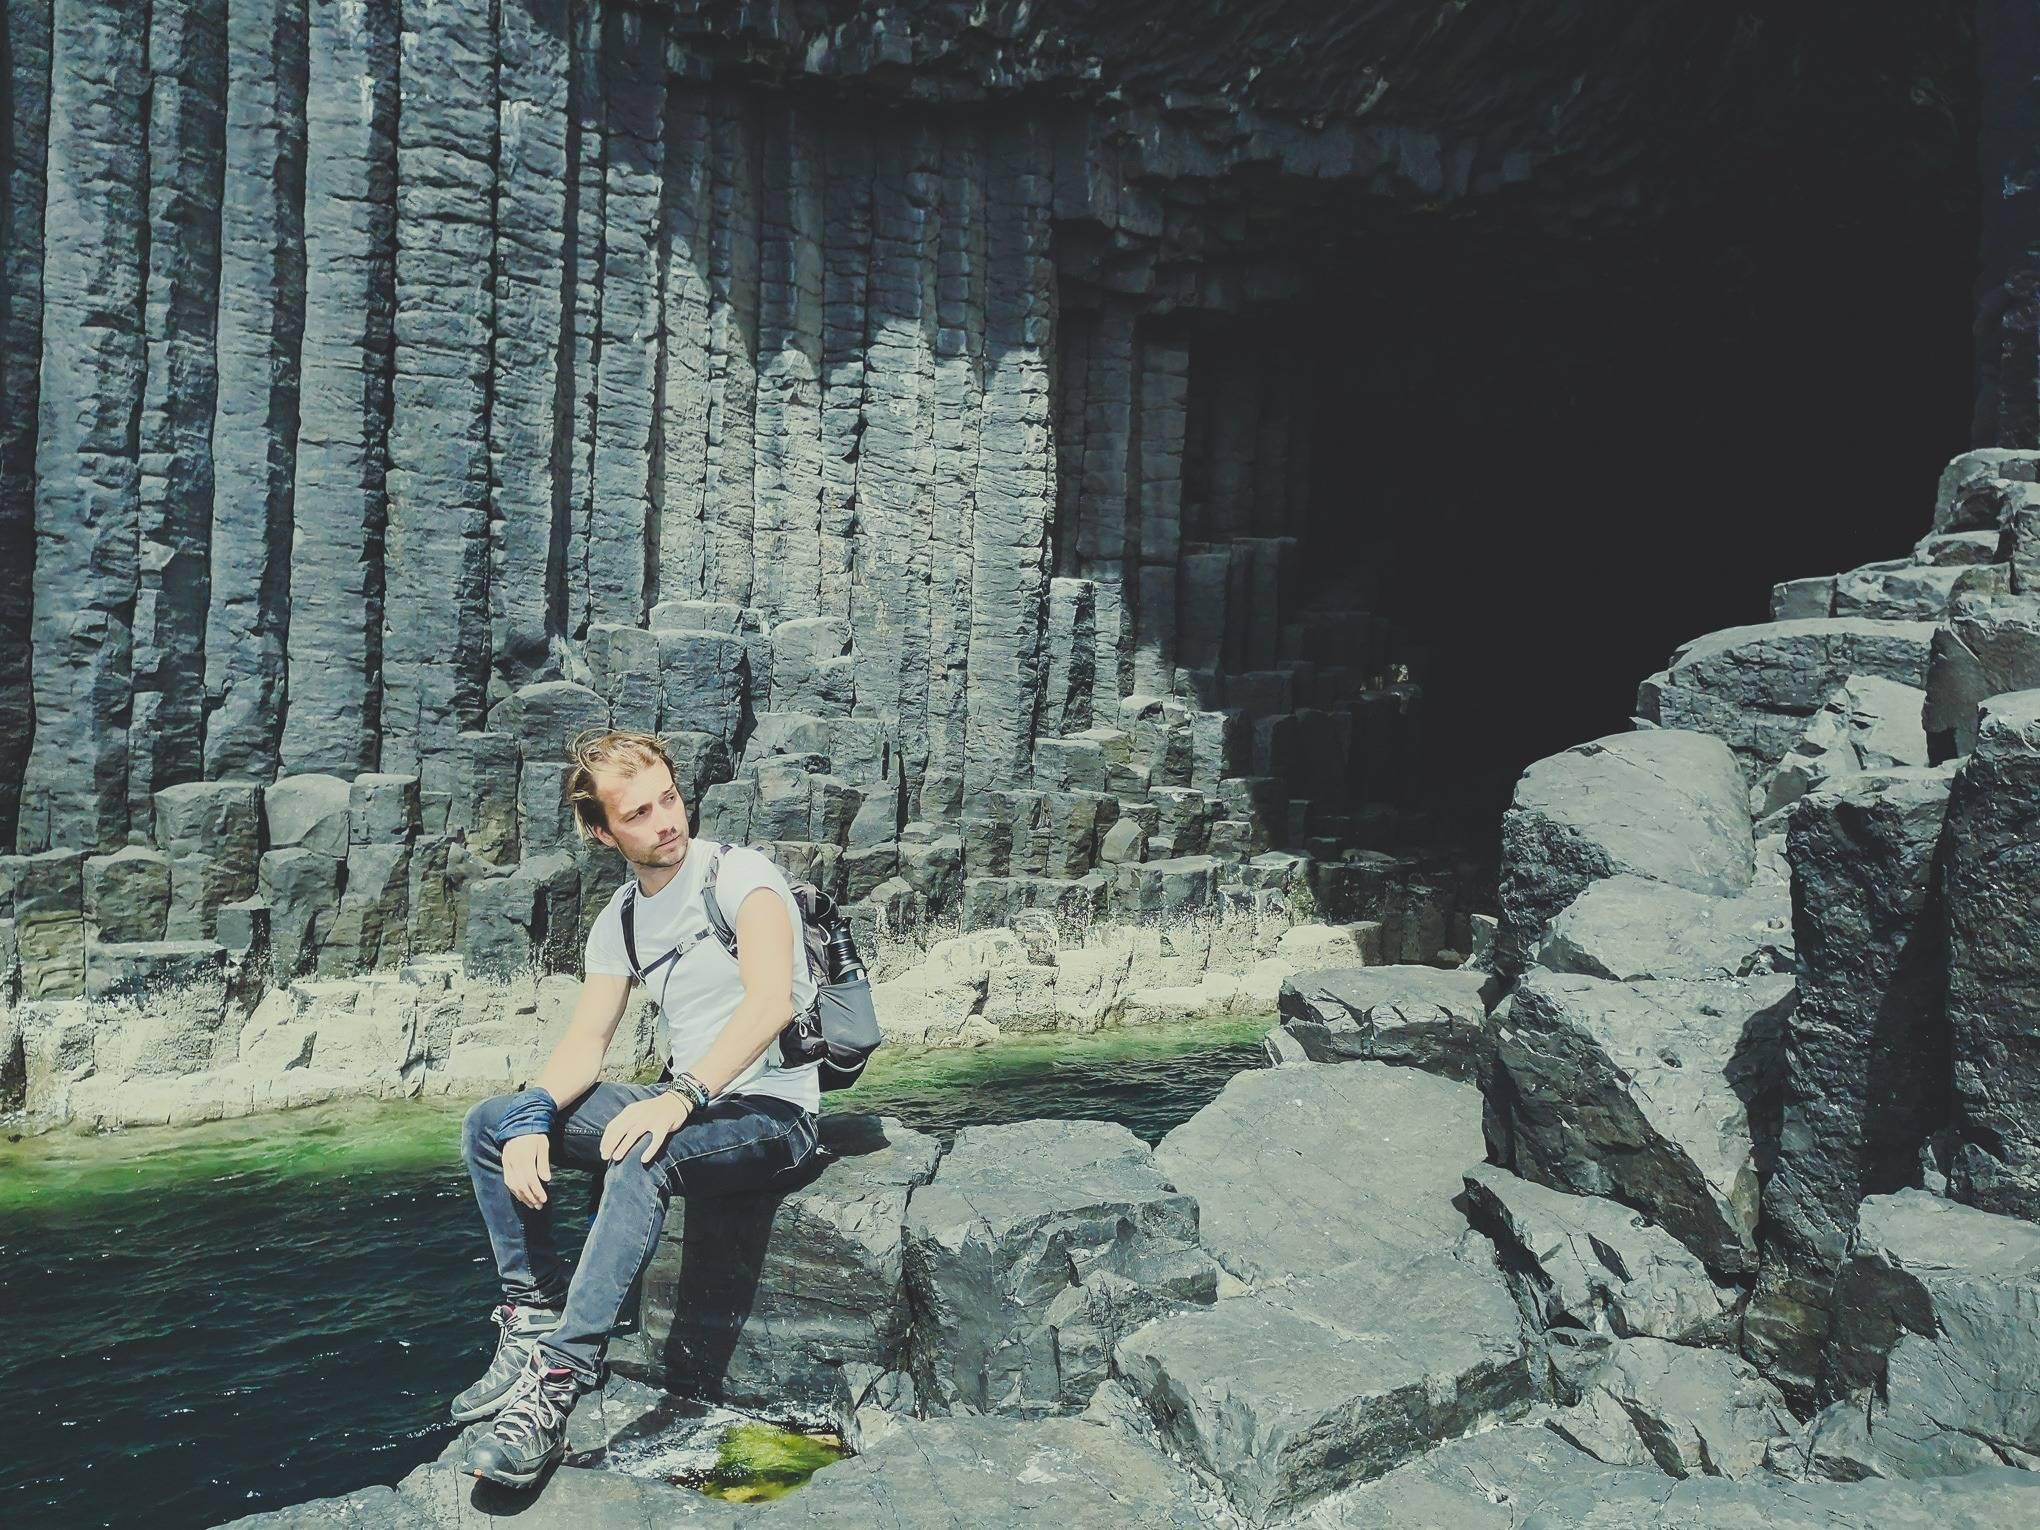 Sitting near FIngal's Cave, Staffa Island